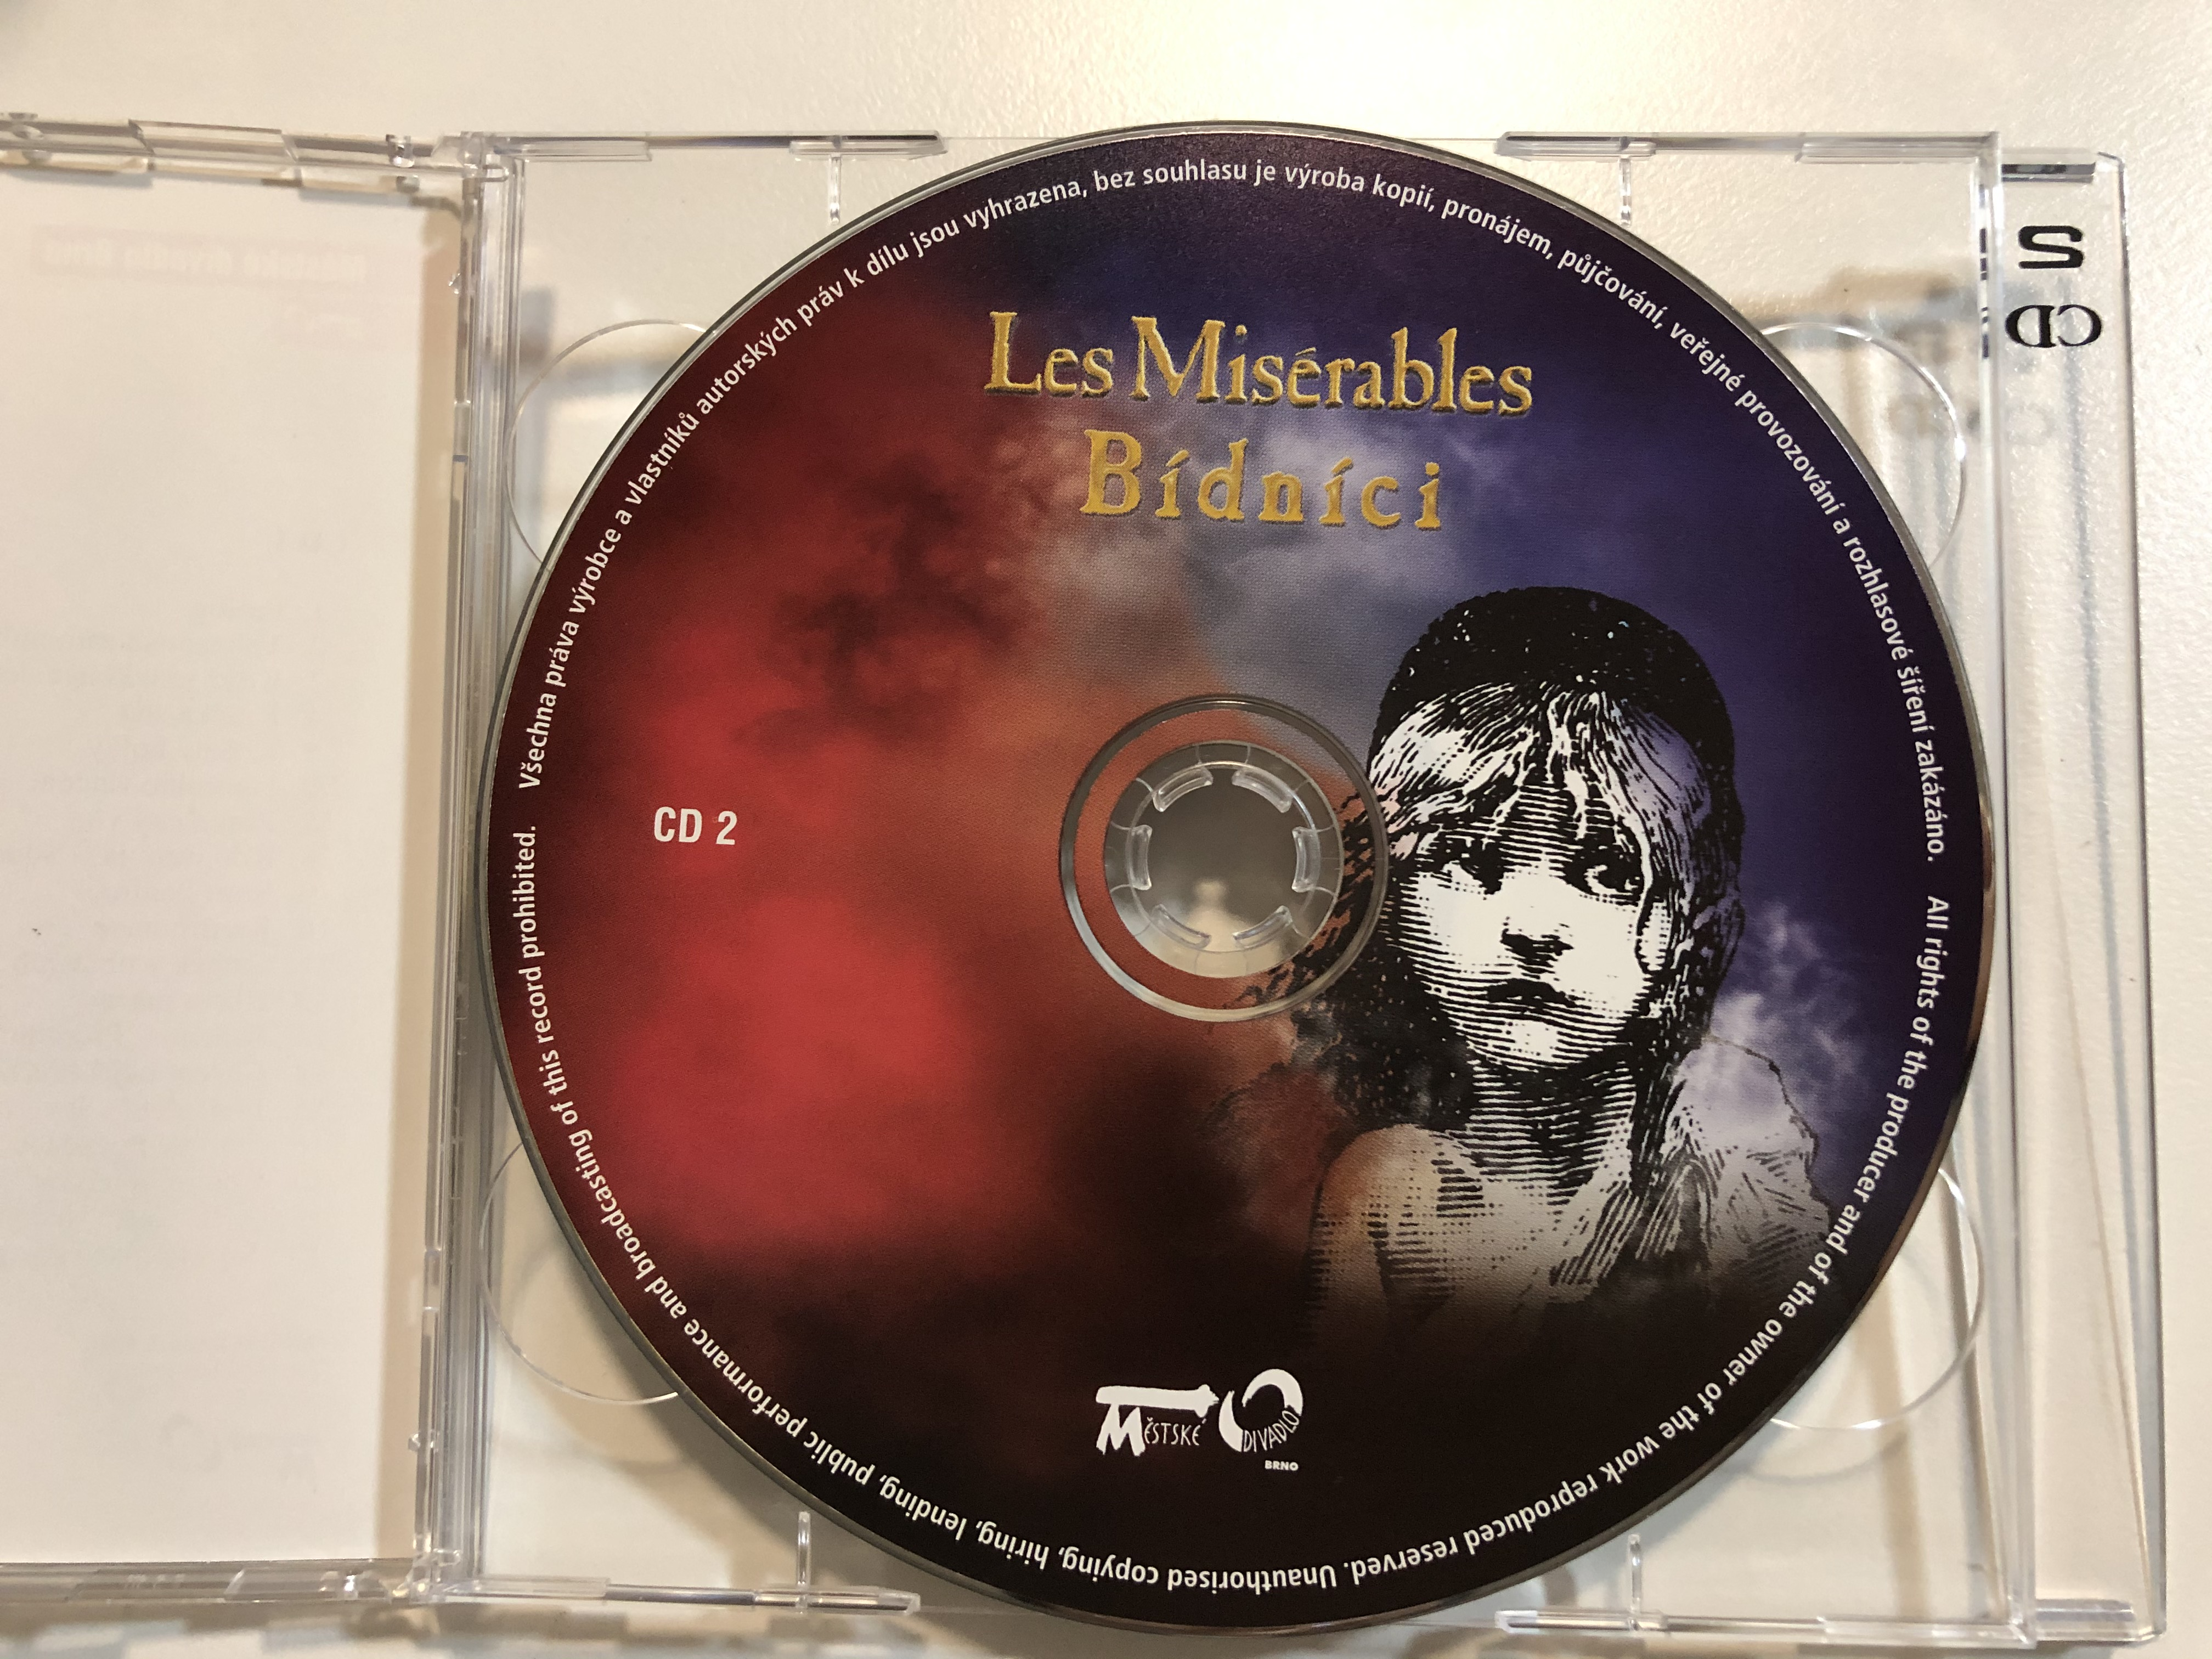 alain-boublil-a-claude-michel-schonberg-les-miserables-bidnici-original-london-production-by-cameron-mackintosh-and-royal-shakespeare-company-mestske-divadlo-brno-2x-audio-cd-10-.jpg